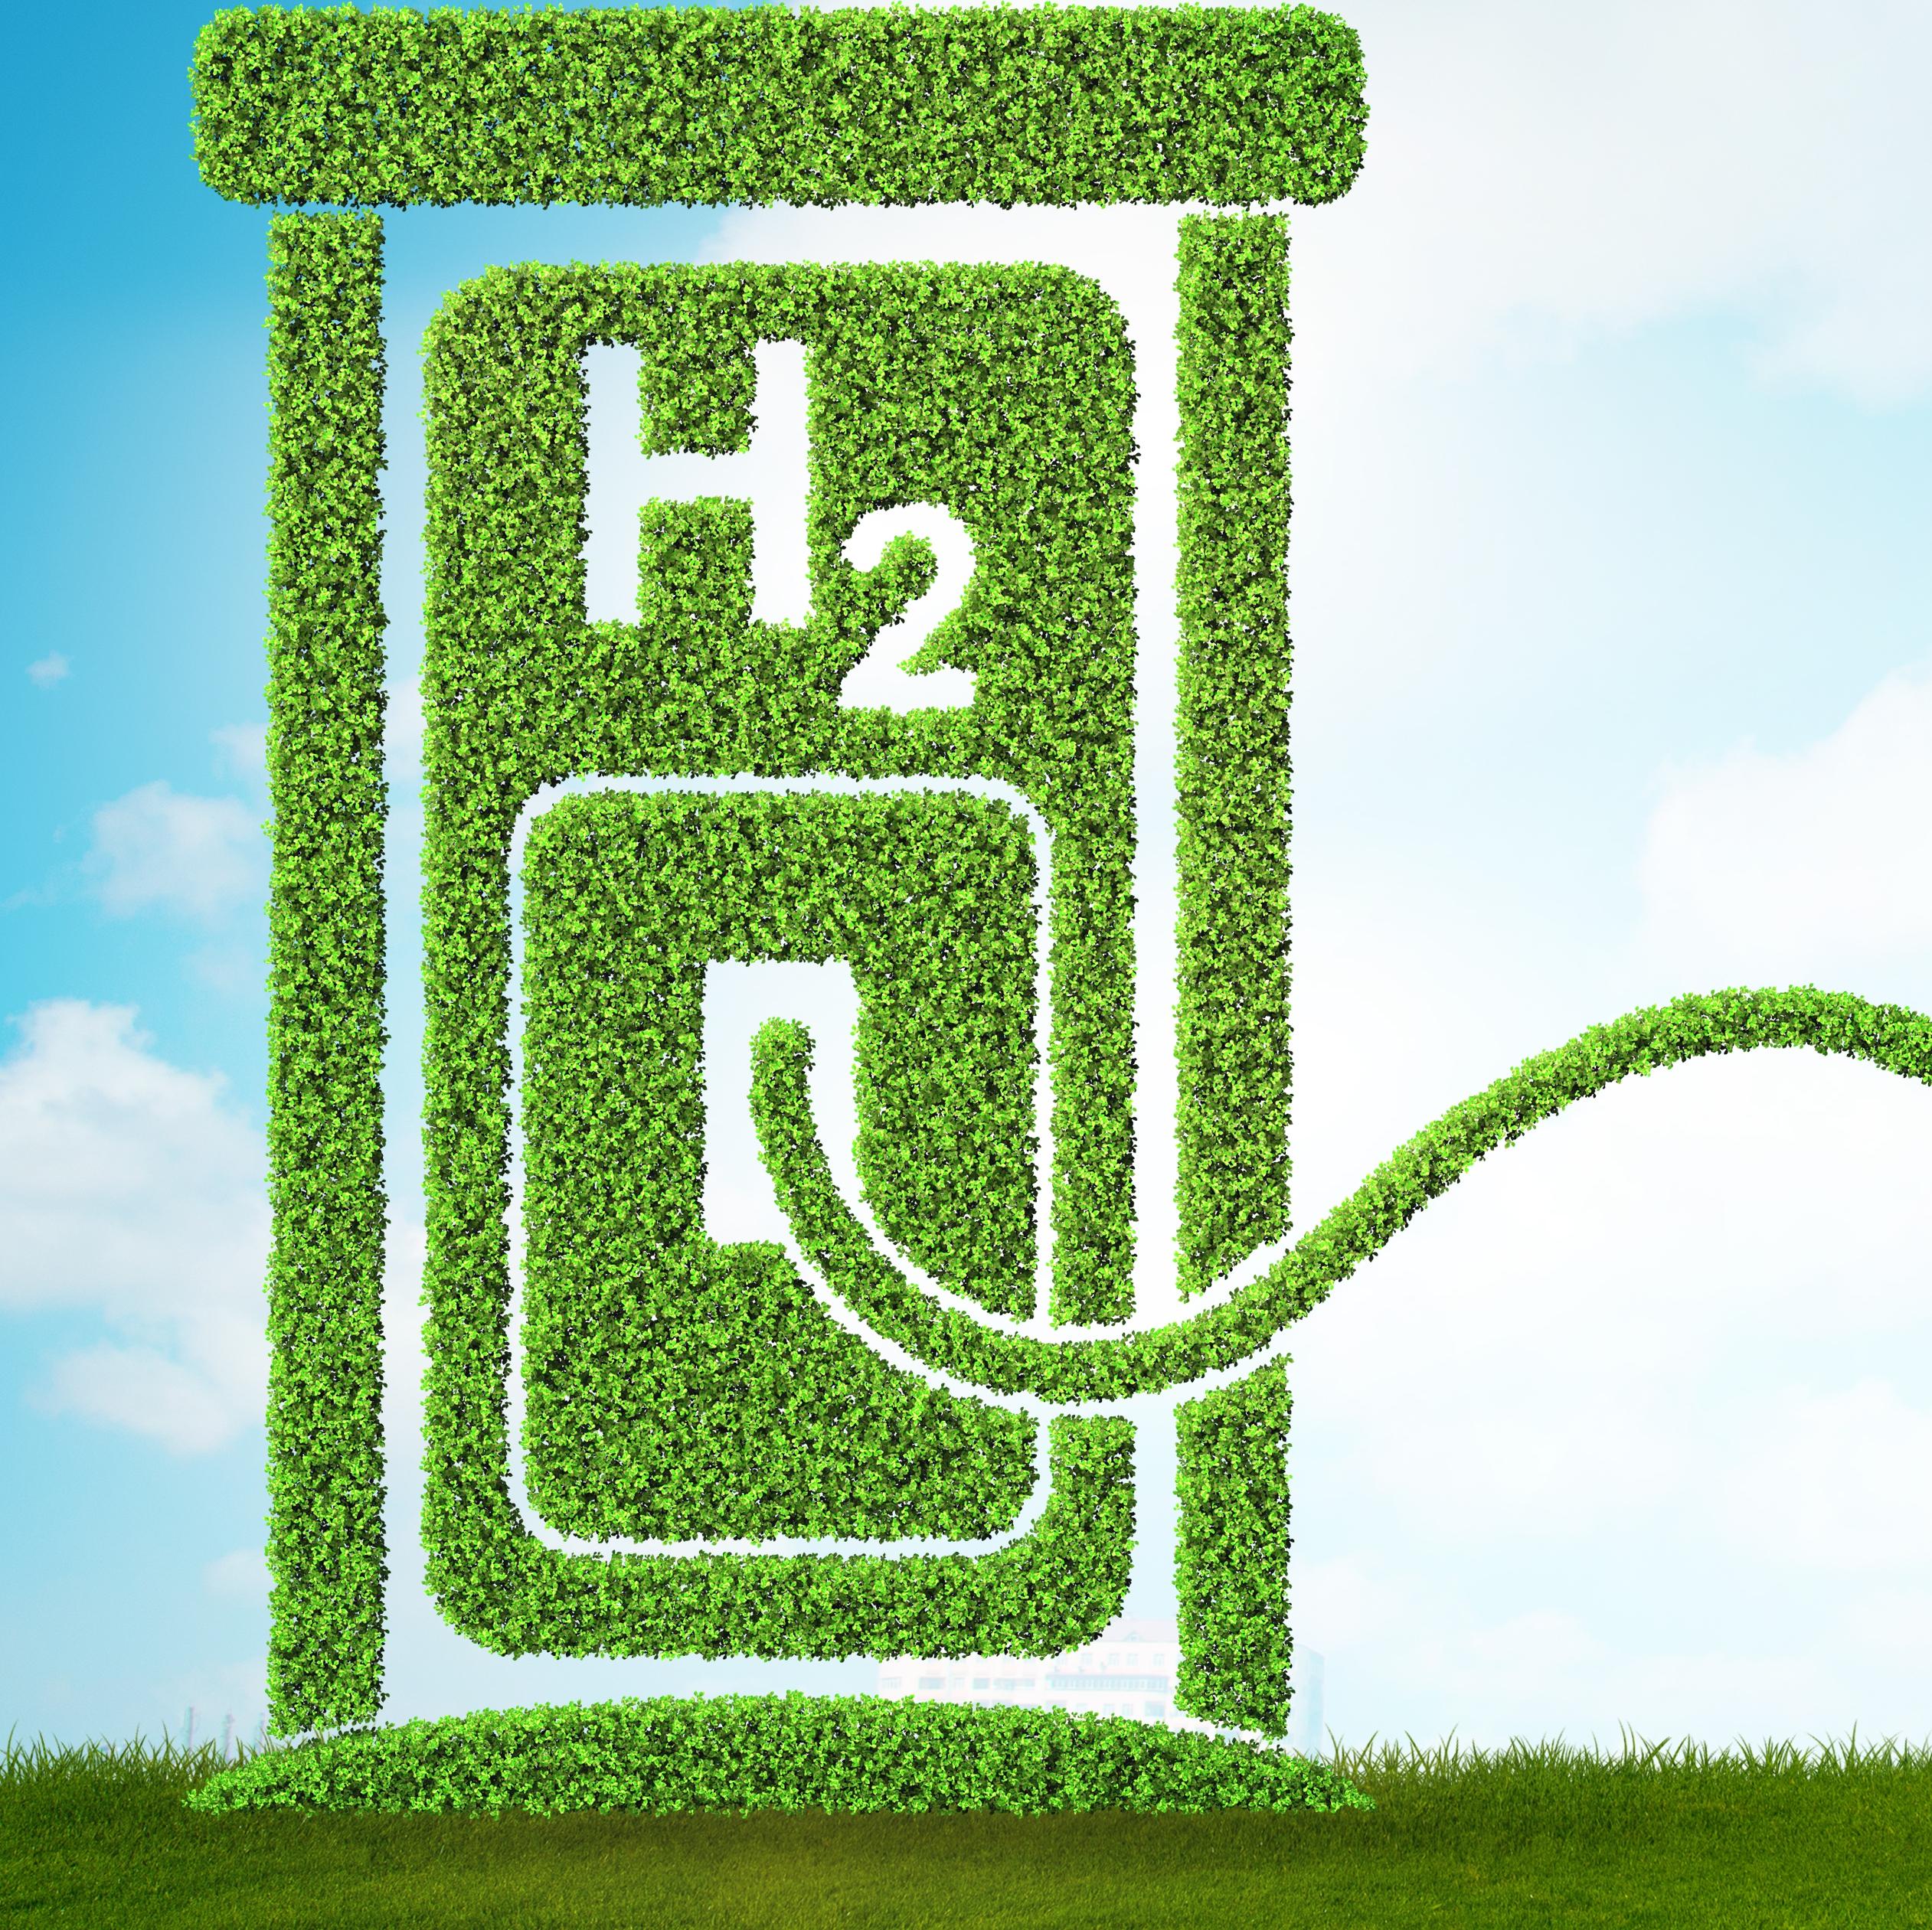 Infrastruktur for alternative drivstoff i Trondheim